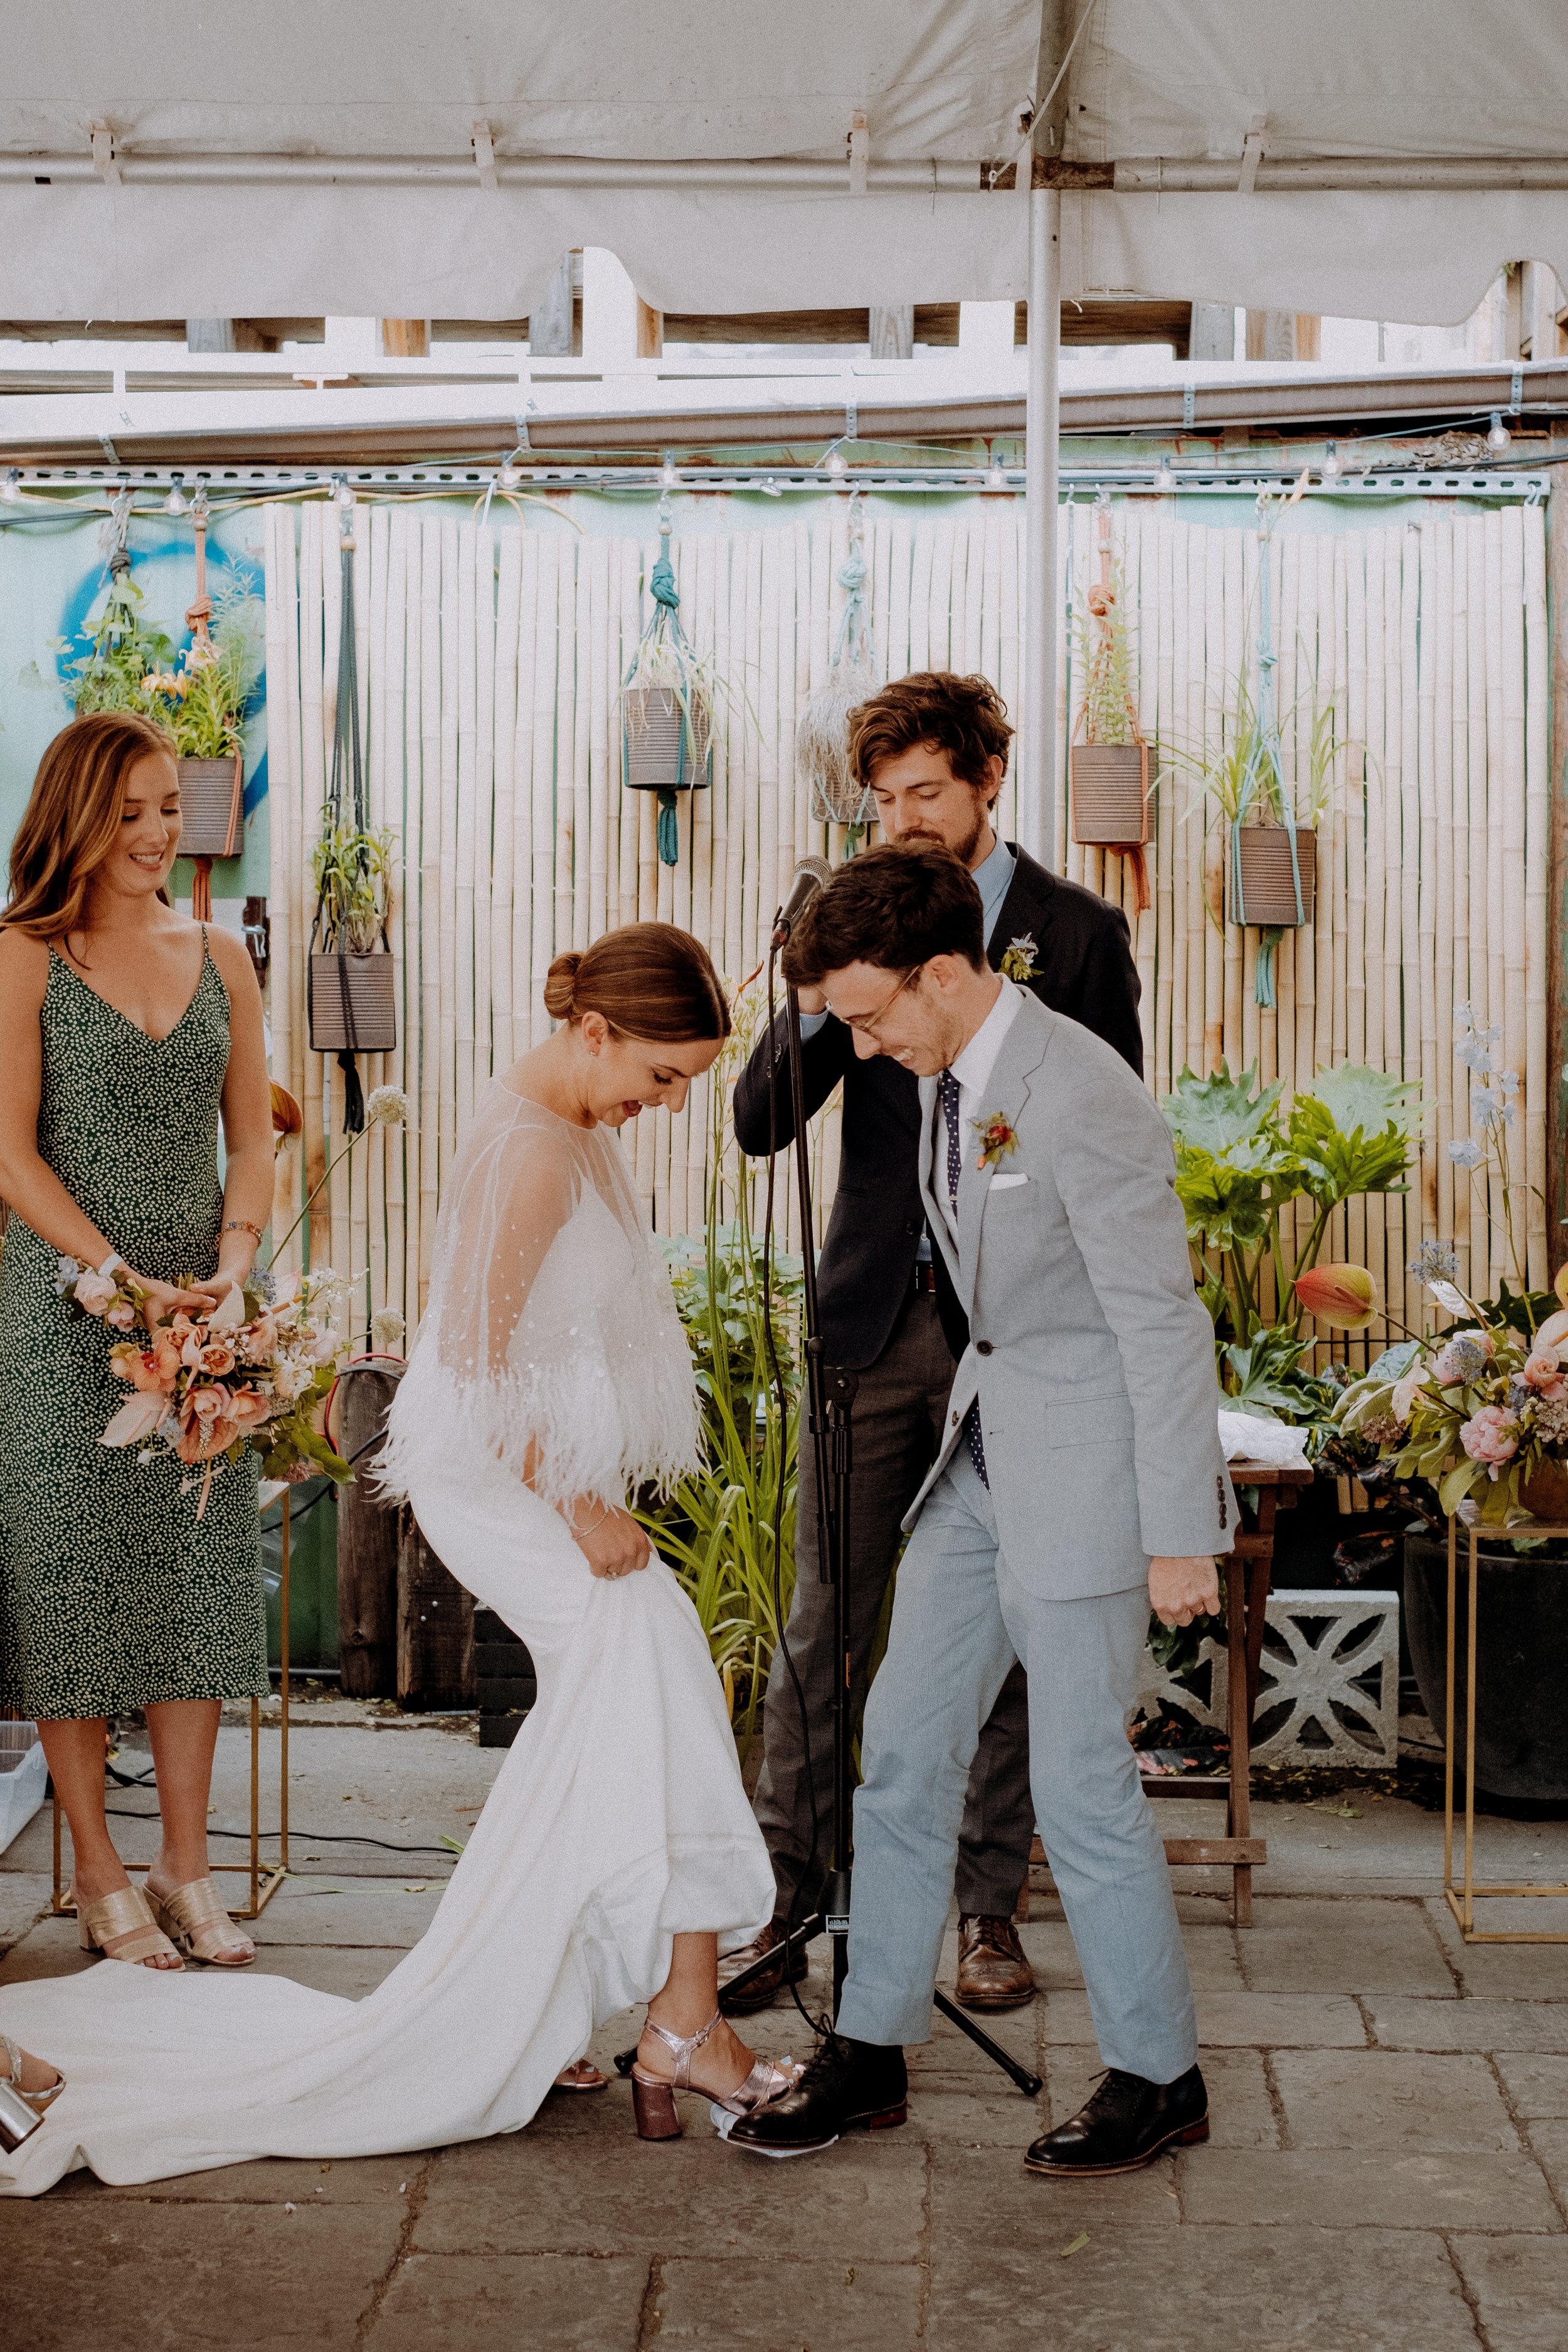 Chellise_Michael_Photography_Robertas_Brooklyn_Wedding_Photographer-501.jpg